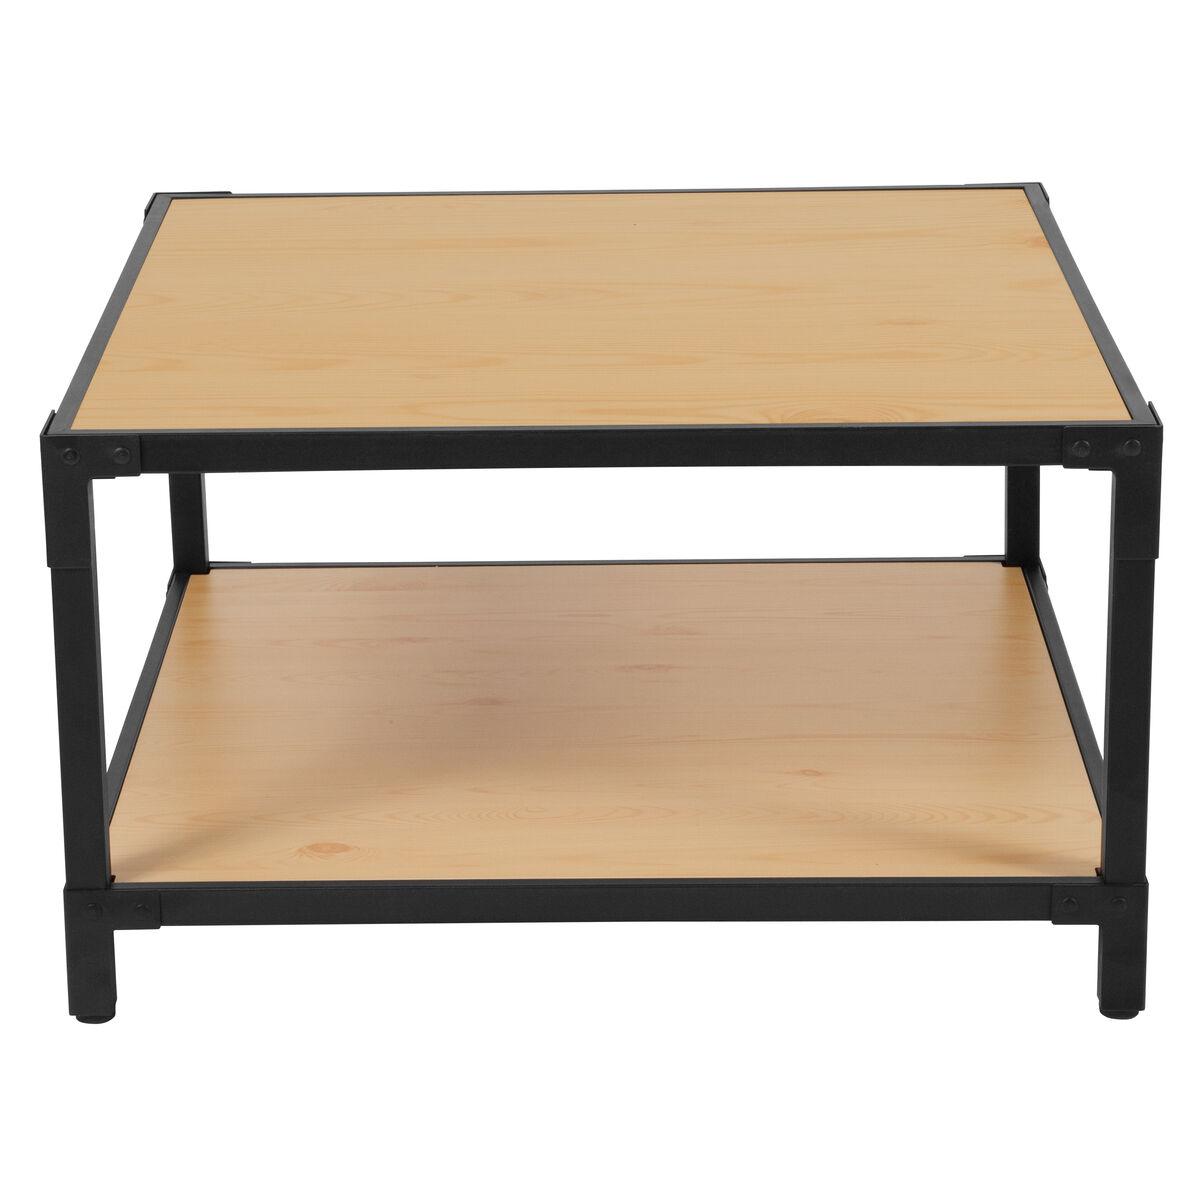 Pine Wood Coffee Table NANJHCTGG Bizchaircom - Flash furniture coffee table